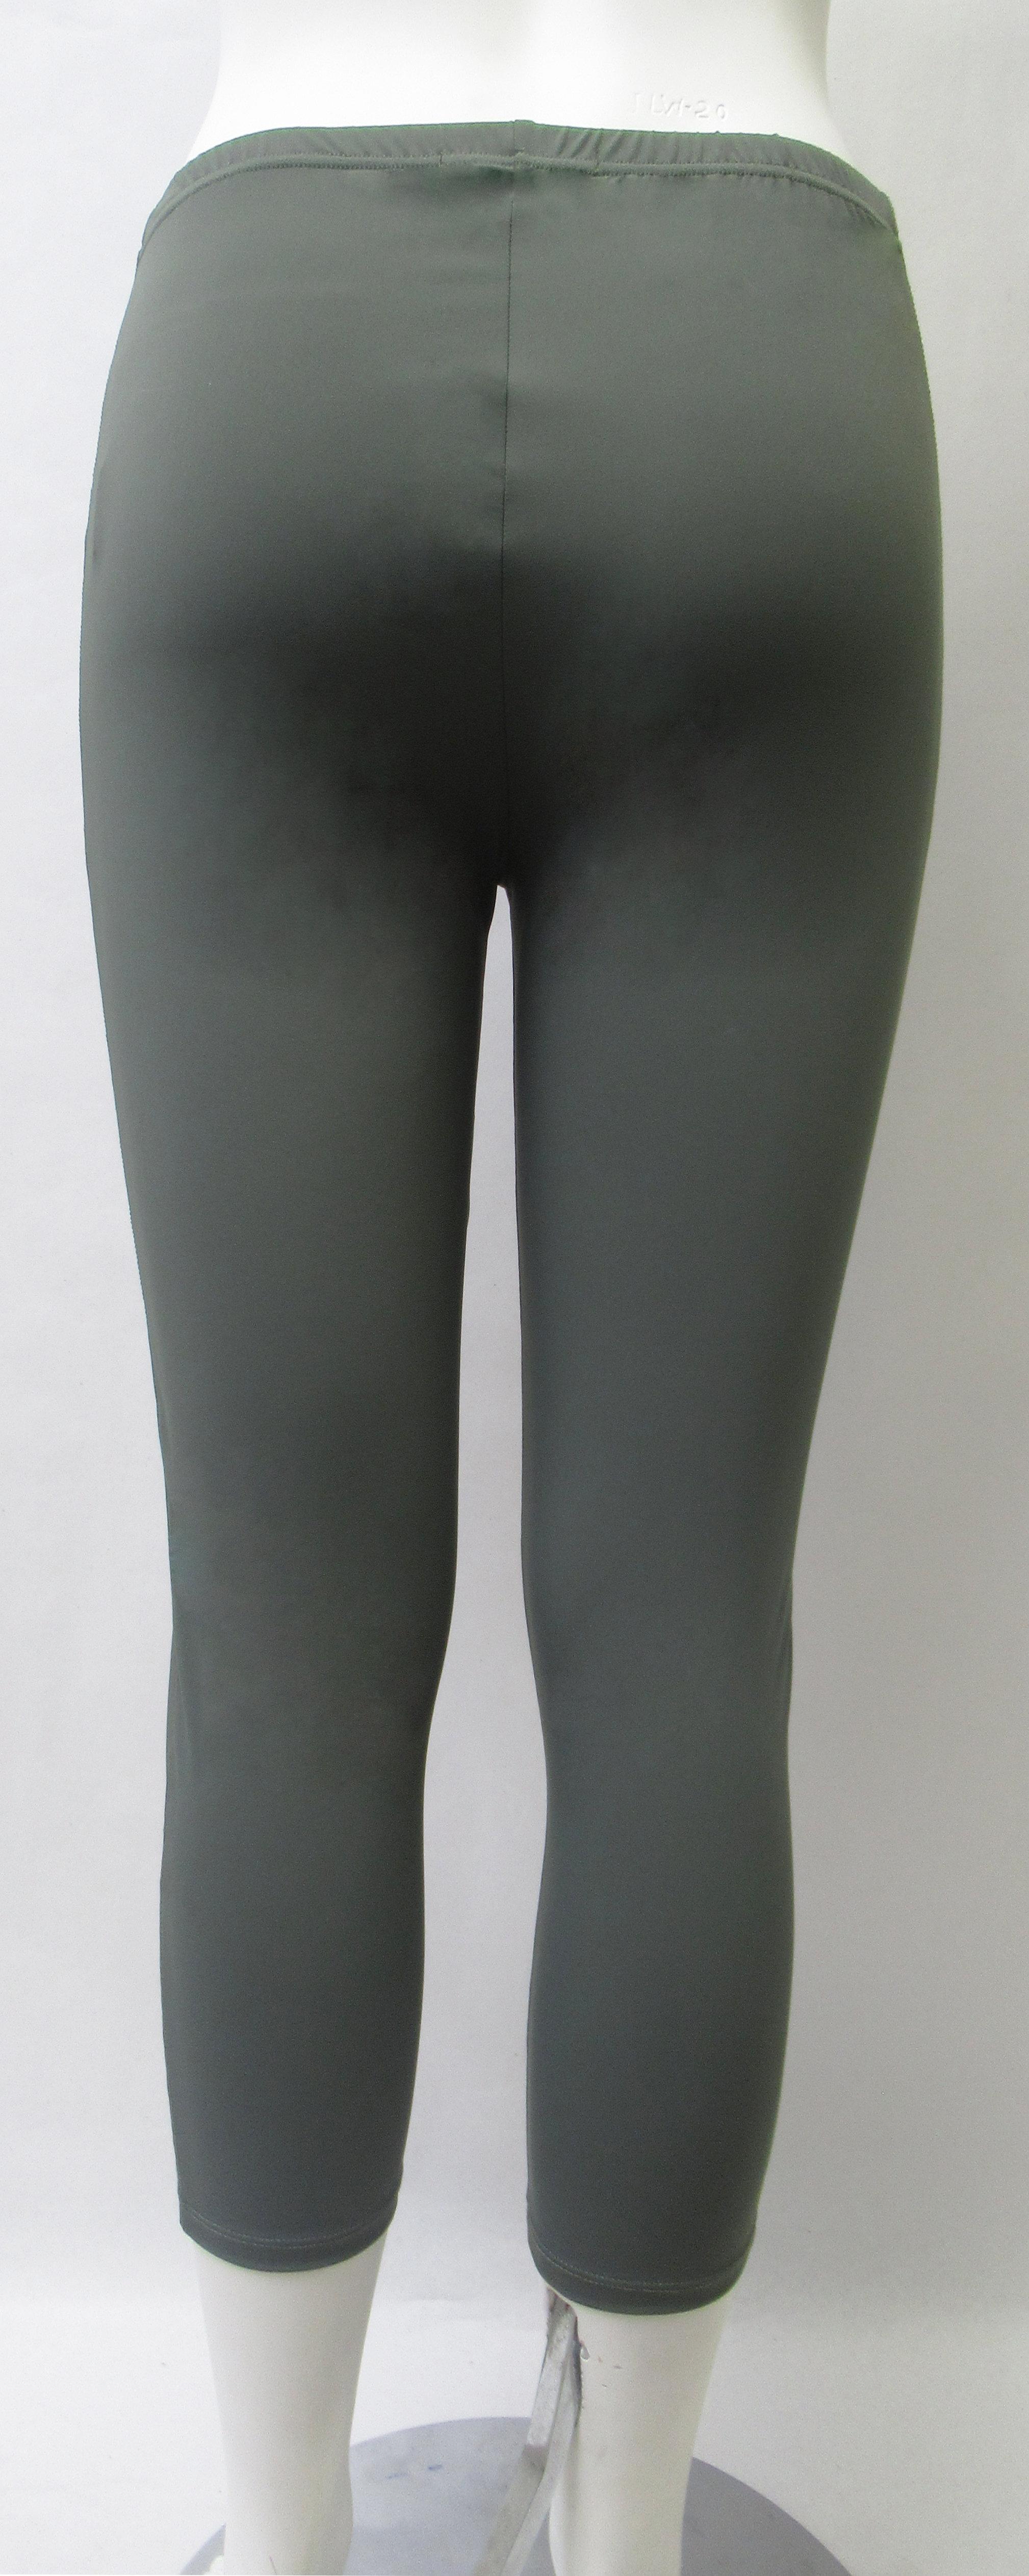 Maloka: Sexy Skyscraper Cropped Legging (Many Colors!)